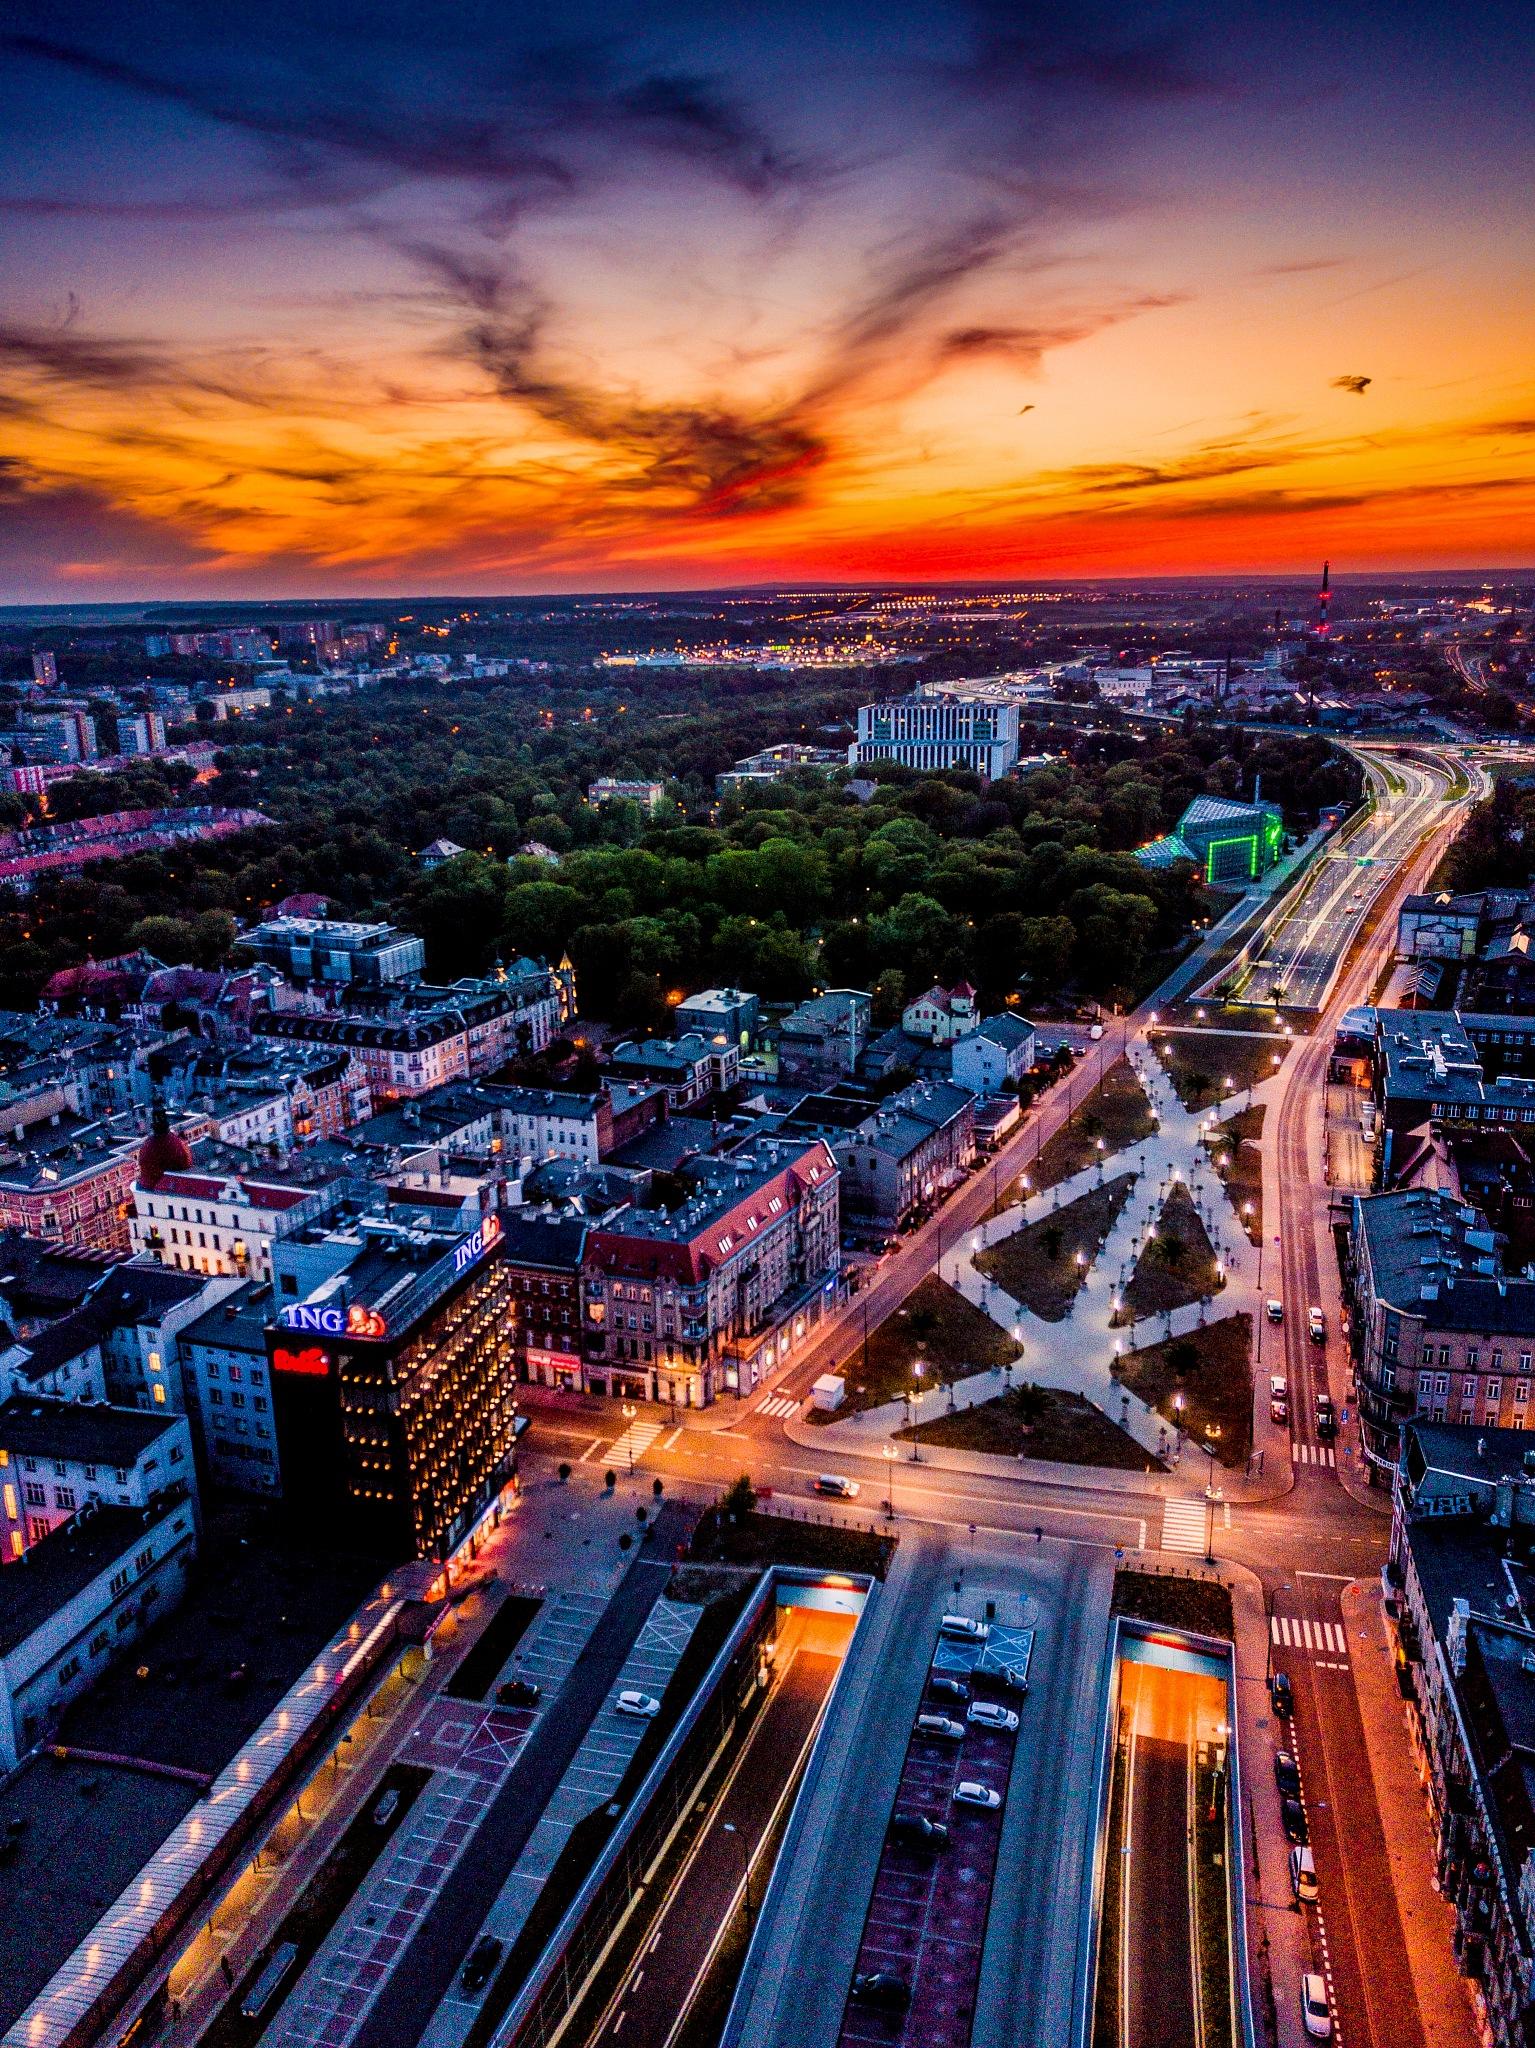 Summer sunset by Kuba Szymik